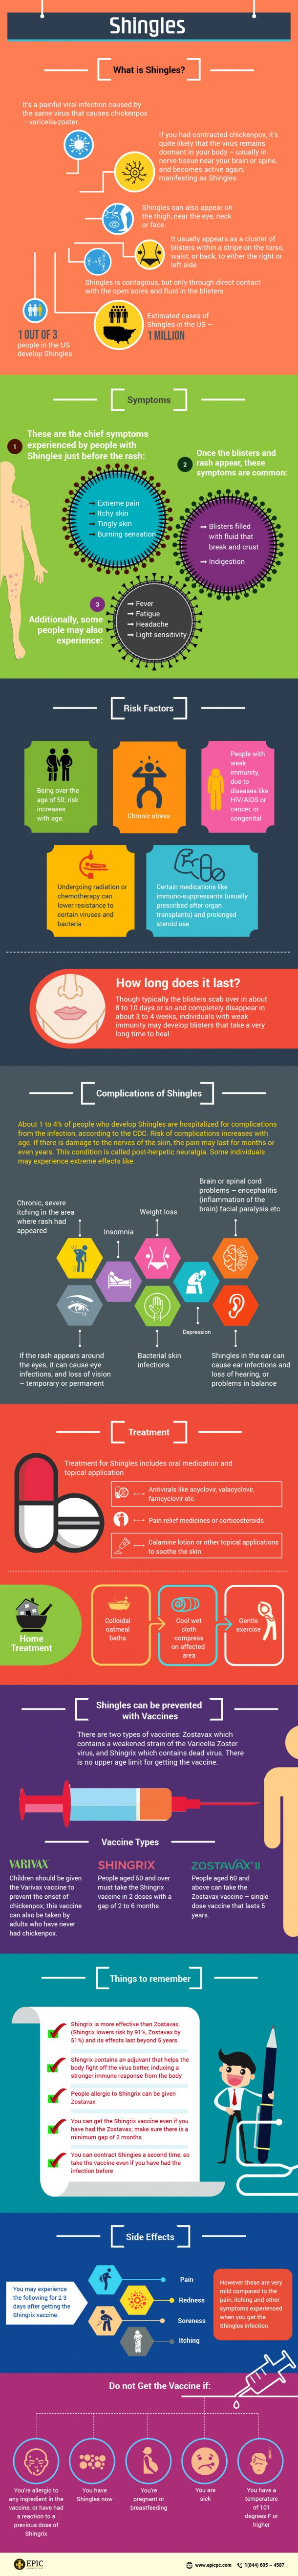 shingles infographic